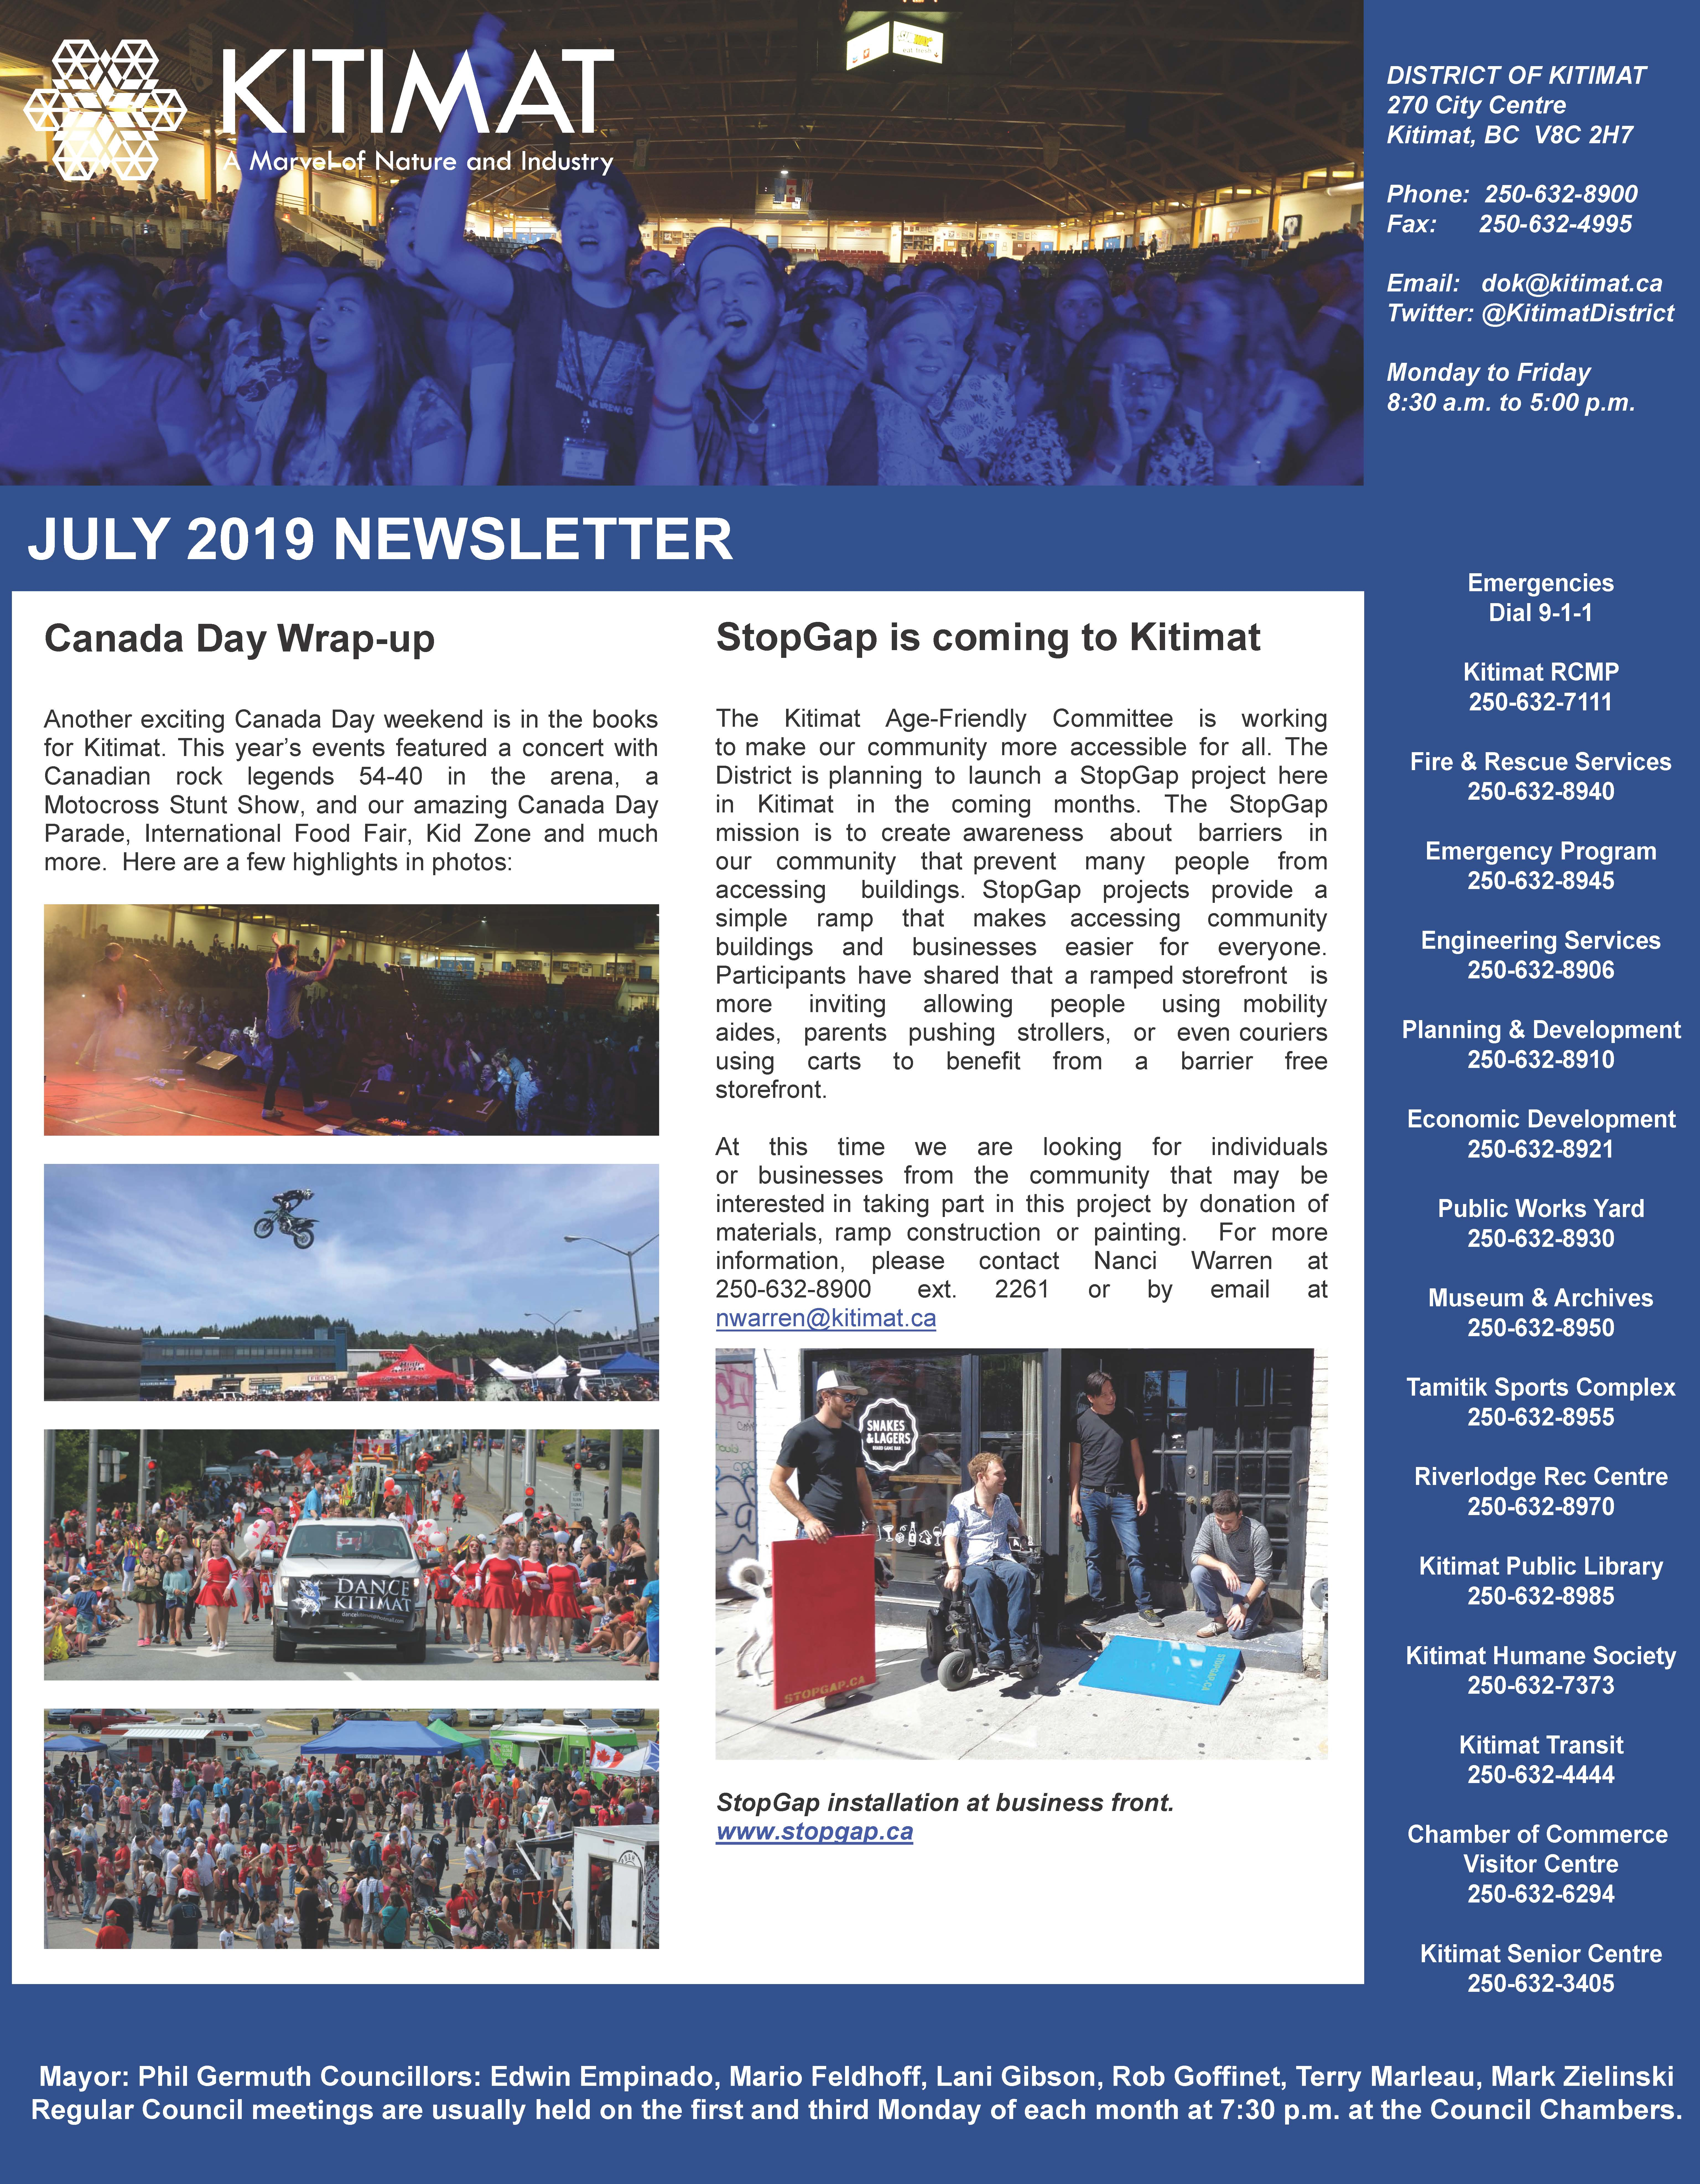 July 2019 DOK Newsletter page 1